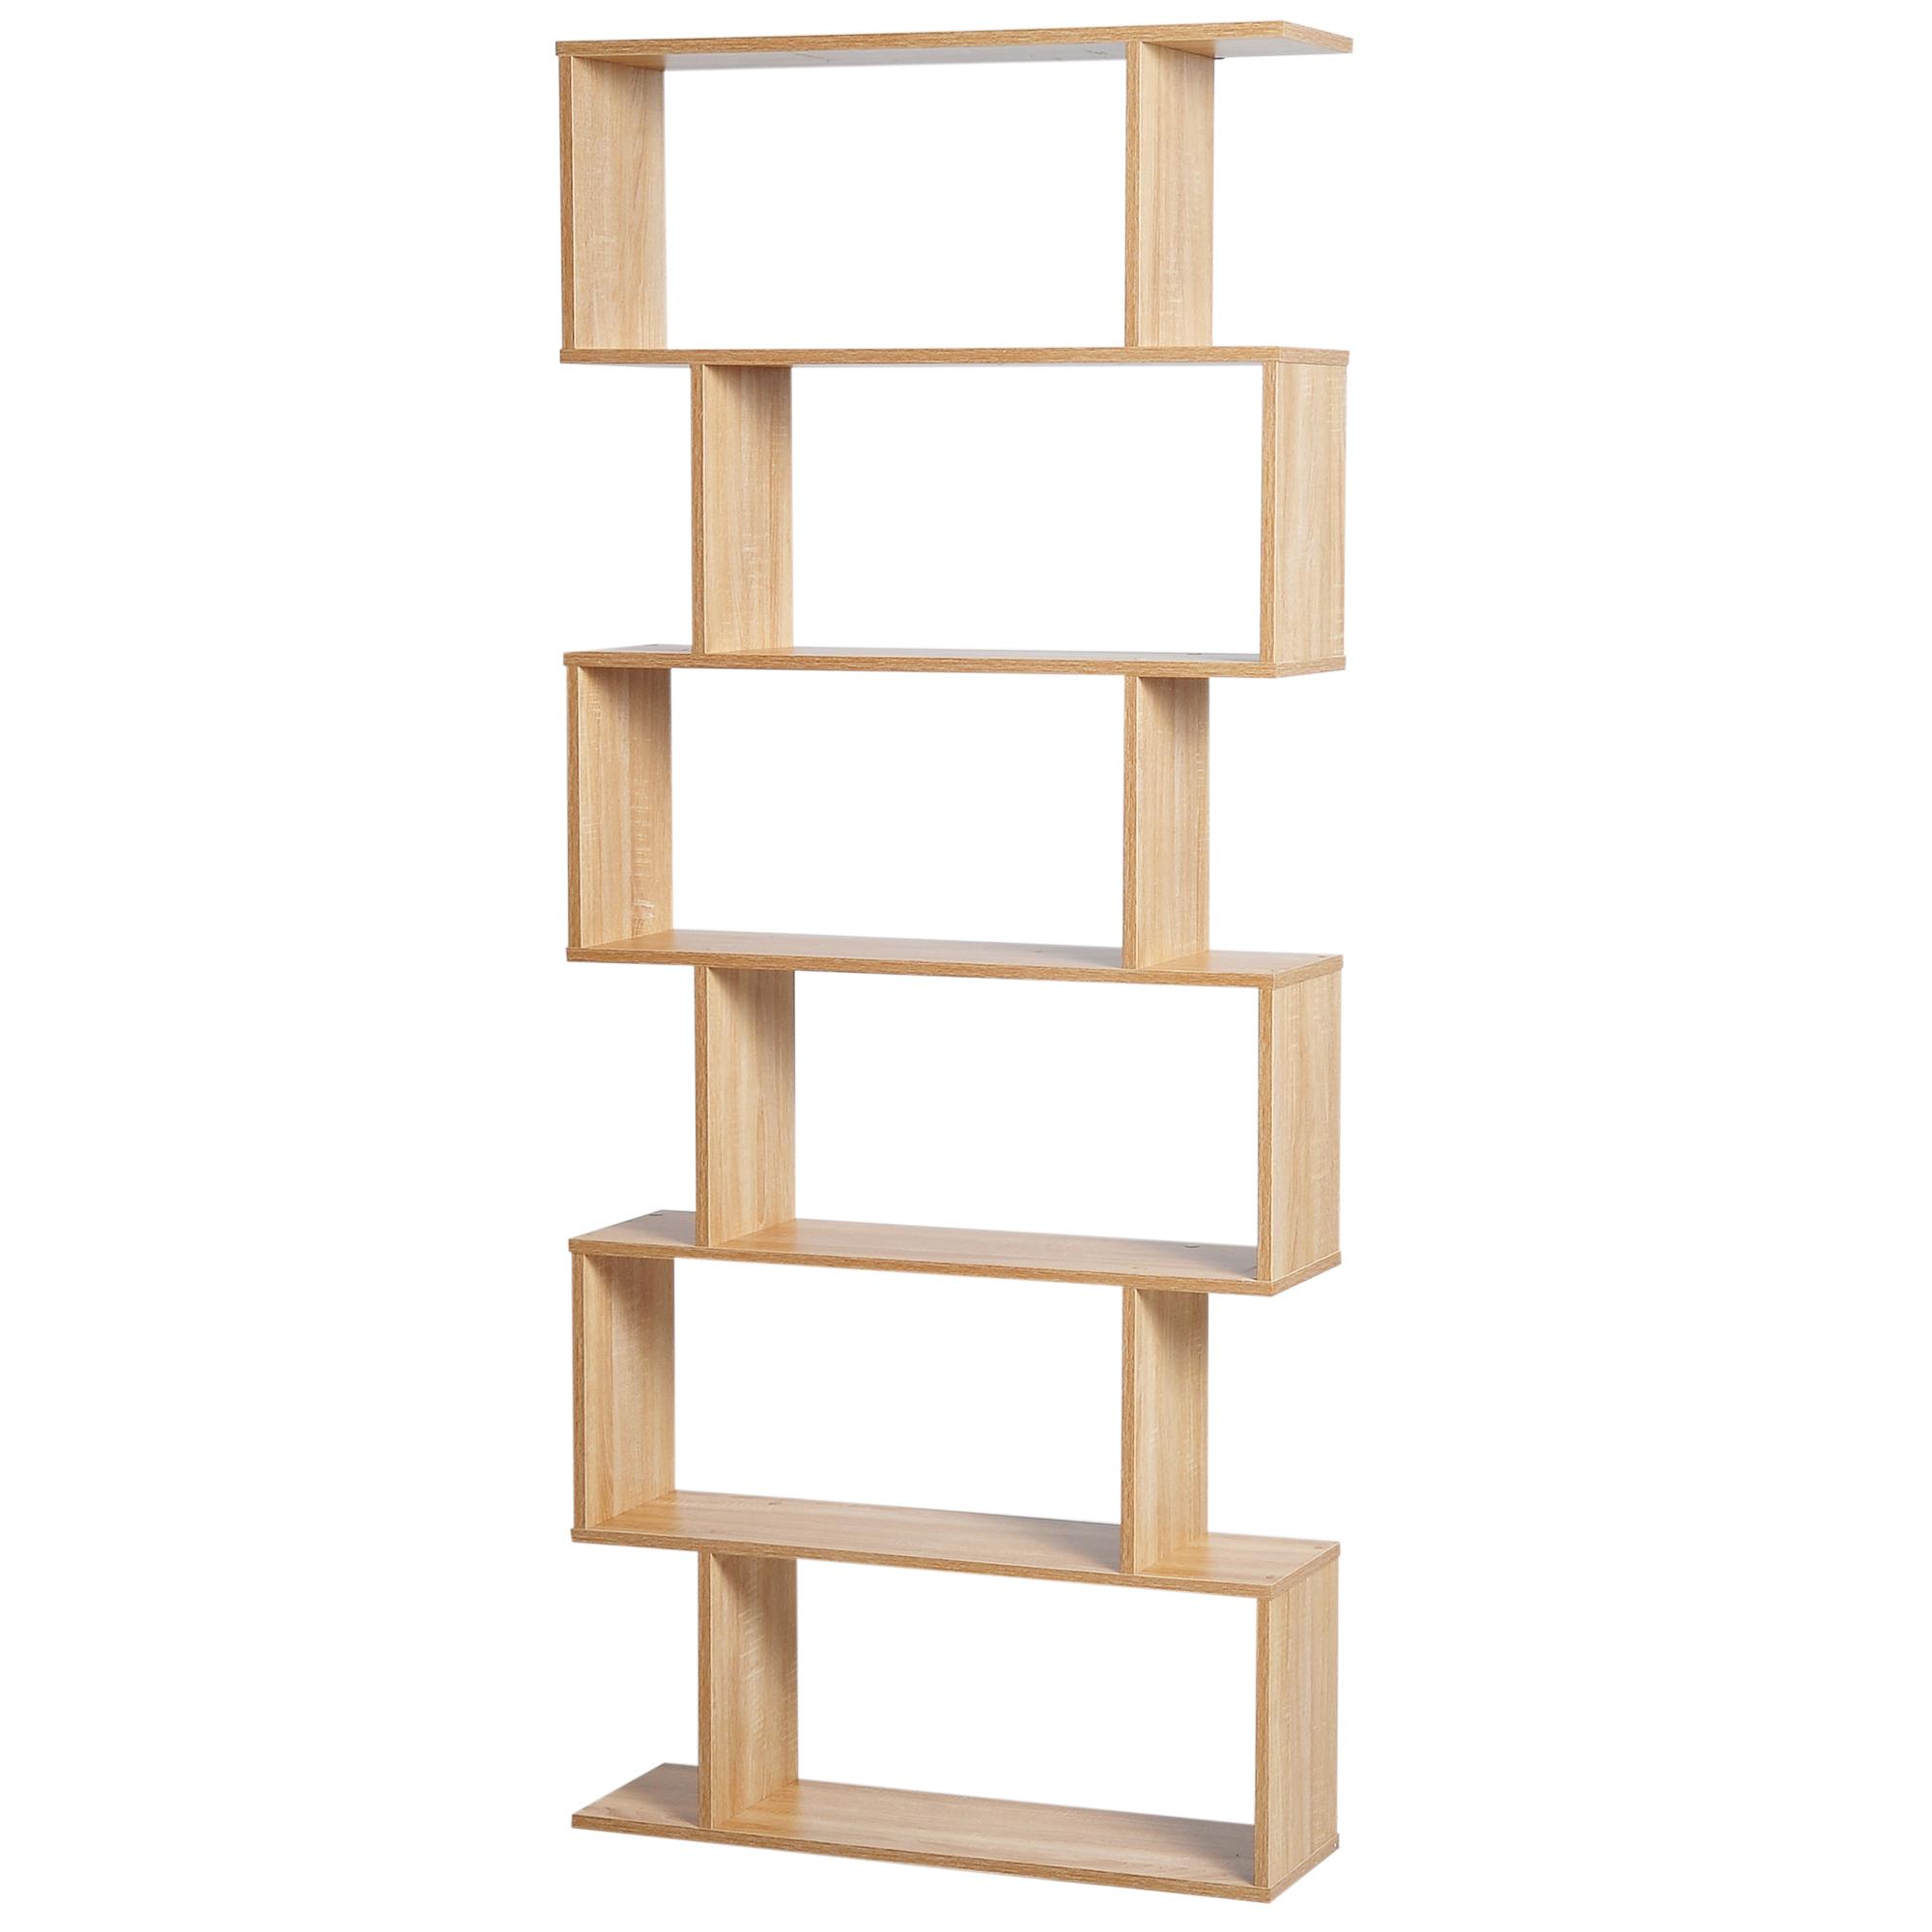 HOMCOM-Bibliotheque-Zig-Zag-Design-Contemporain-6-Niveaux-192-cm